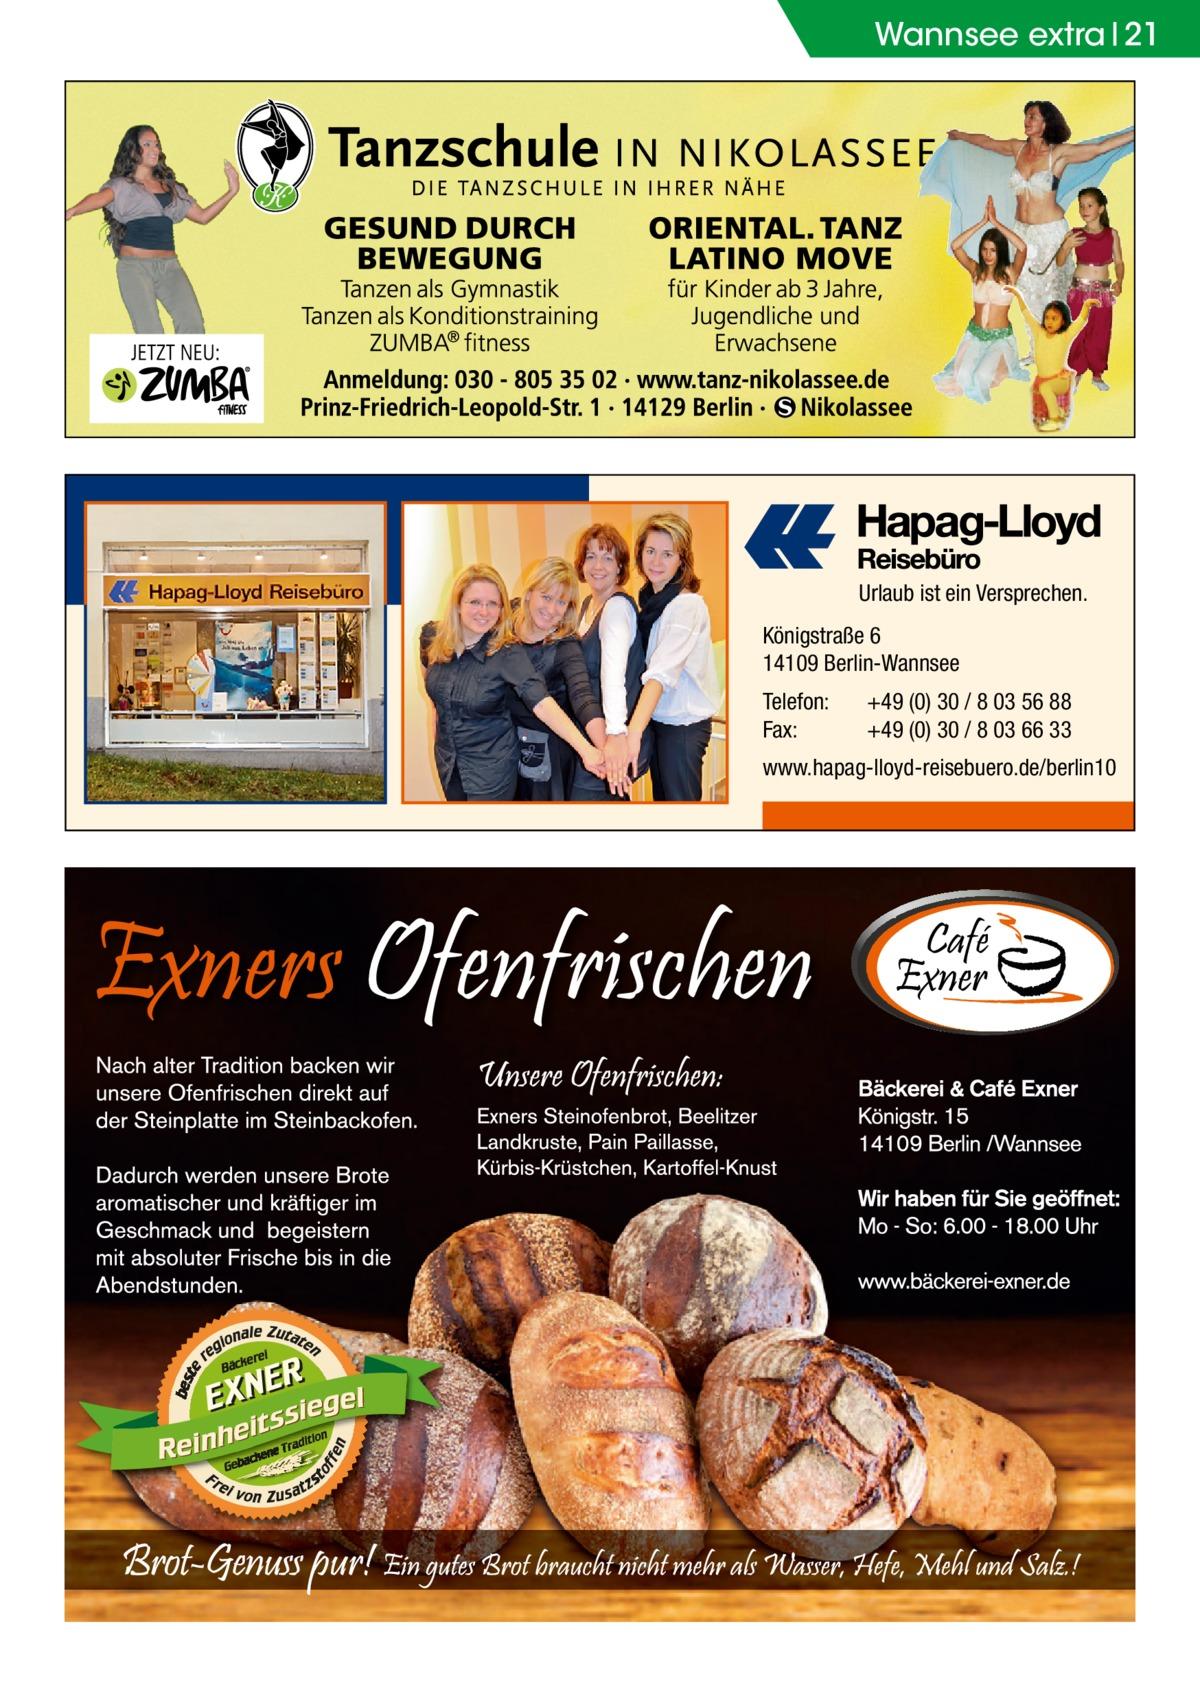 Wannsee extra 21  Urlaub ist ein Versprechen. Königstraße 6 14109 Berlin-Wannsee Telefon: Fax:  +49 (0) 30 / 8 03 56 88 +49 (0) 30 / 8 03 66 33  www.hapag-lloyd-reisebuero.de/berlin10